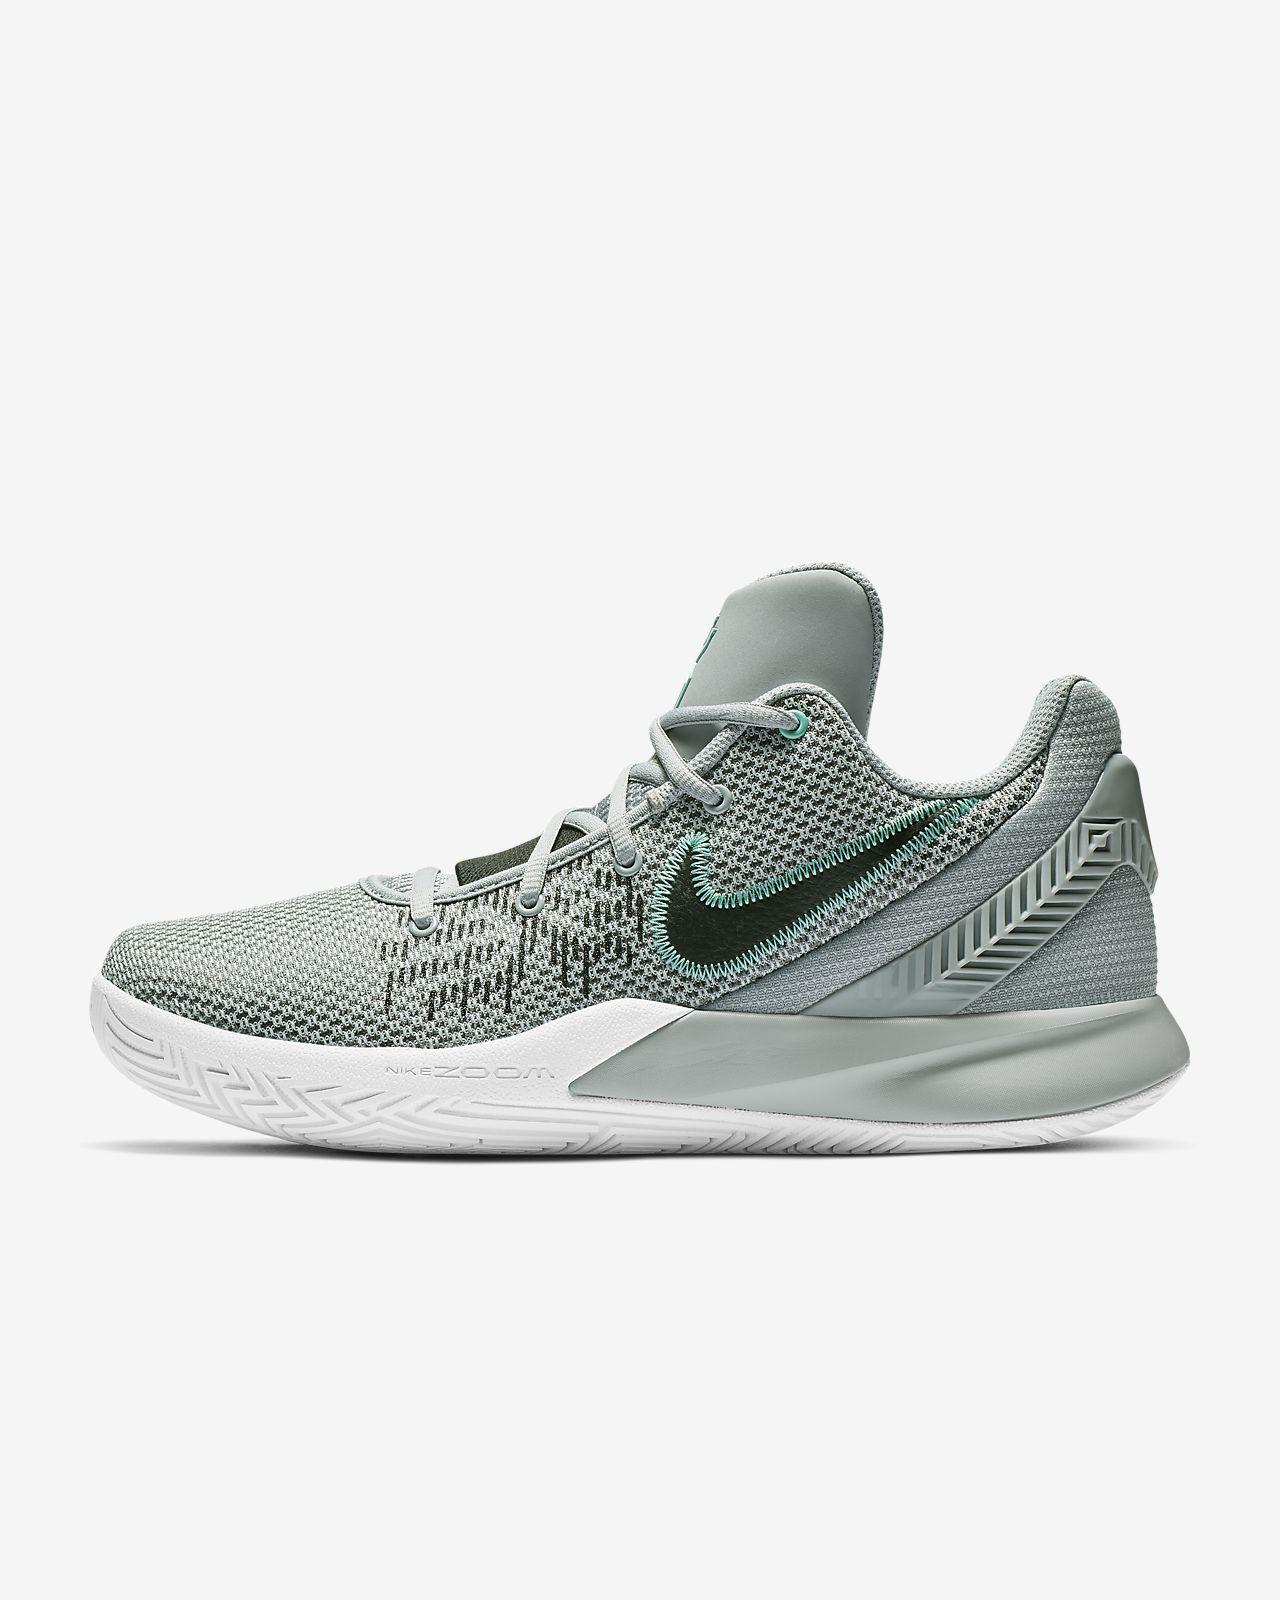 ac8681e4878b1 Kyrie Flytrap II Basketball Shoe. Nike.com DK